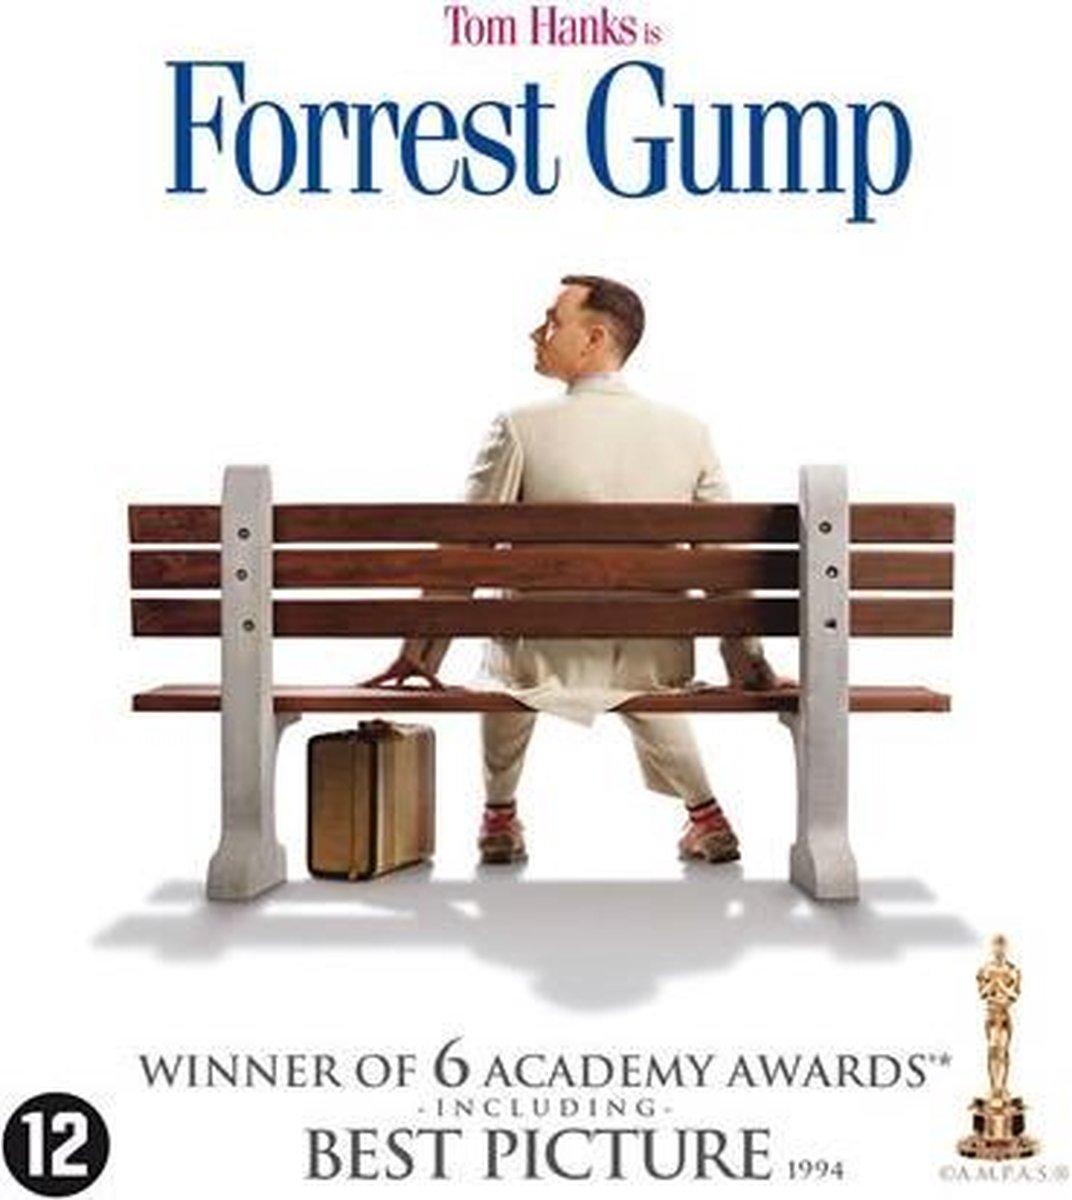 Forrest Gump (Blu-ray) - Movie